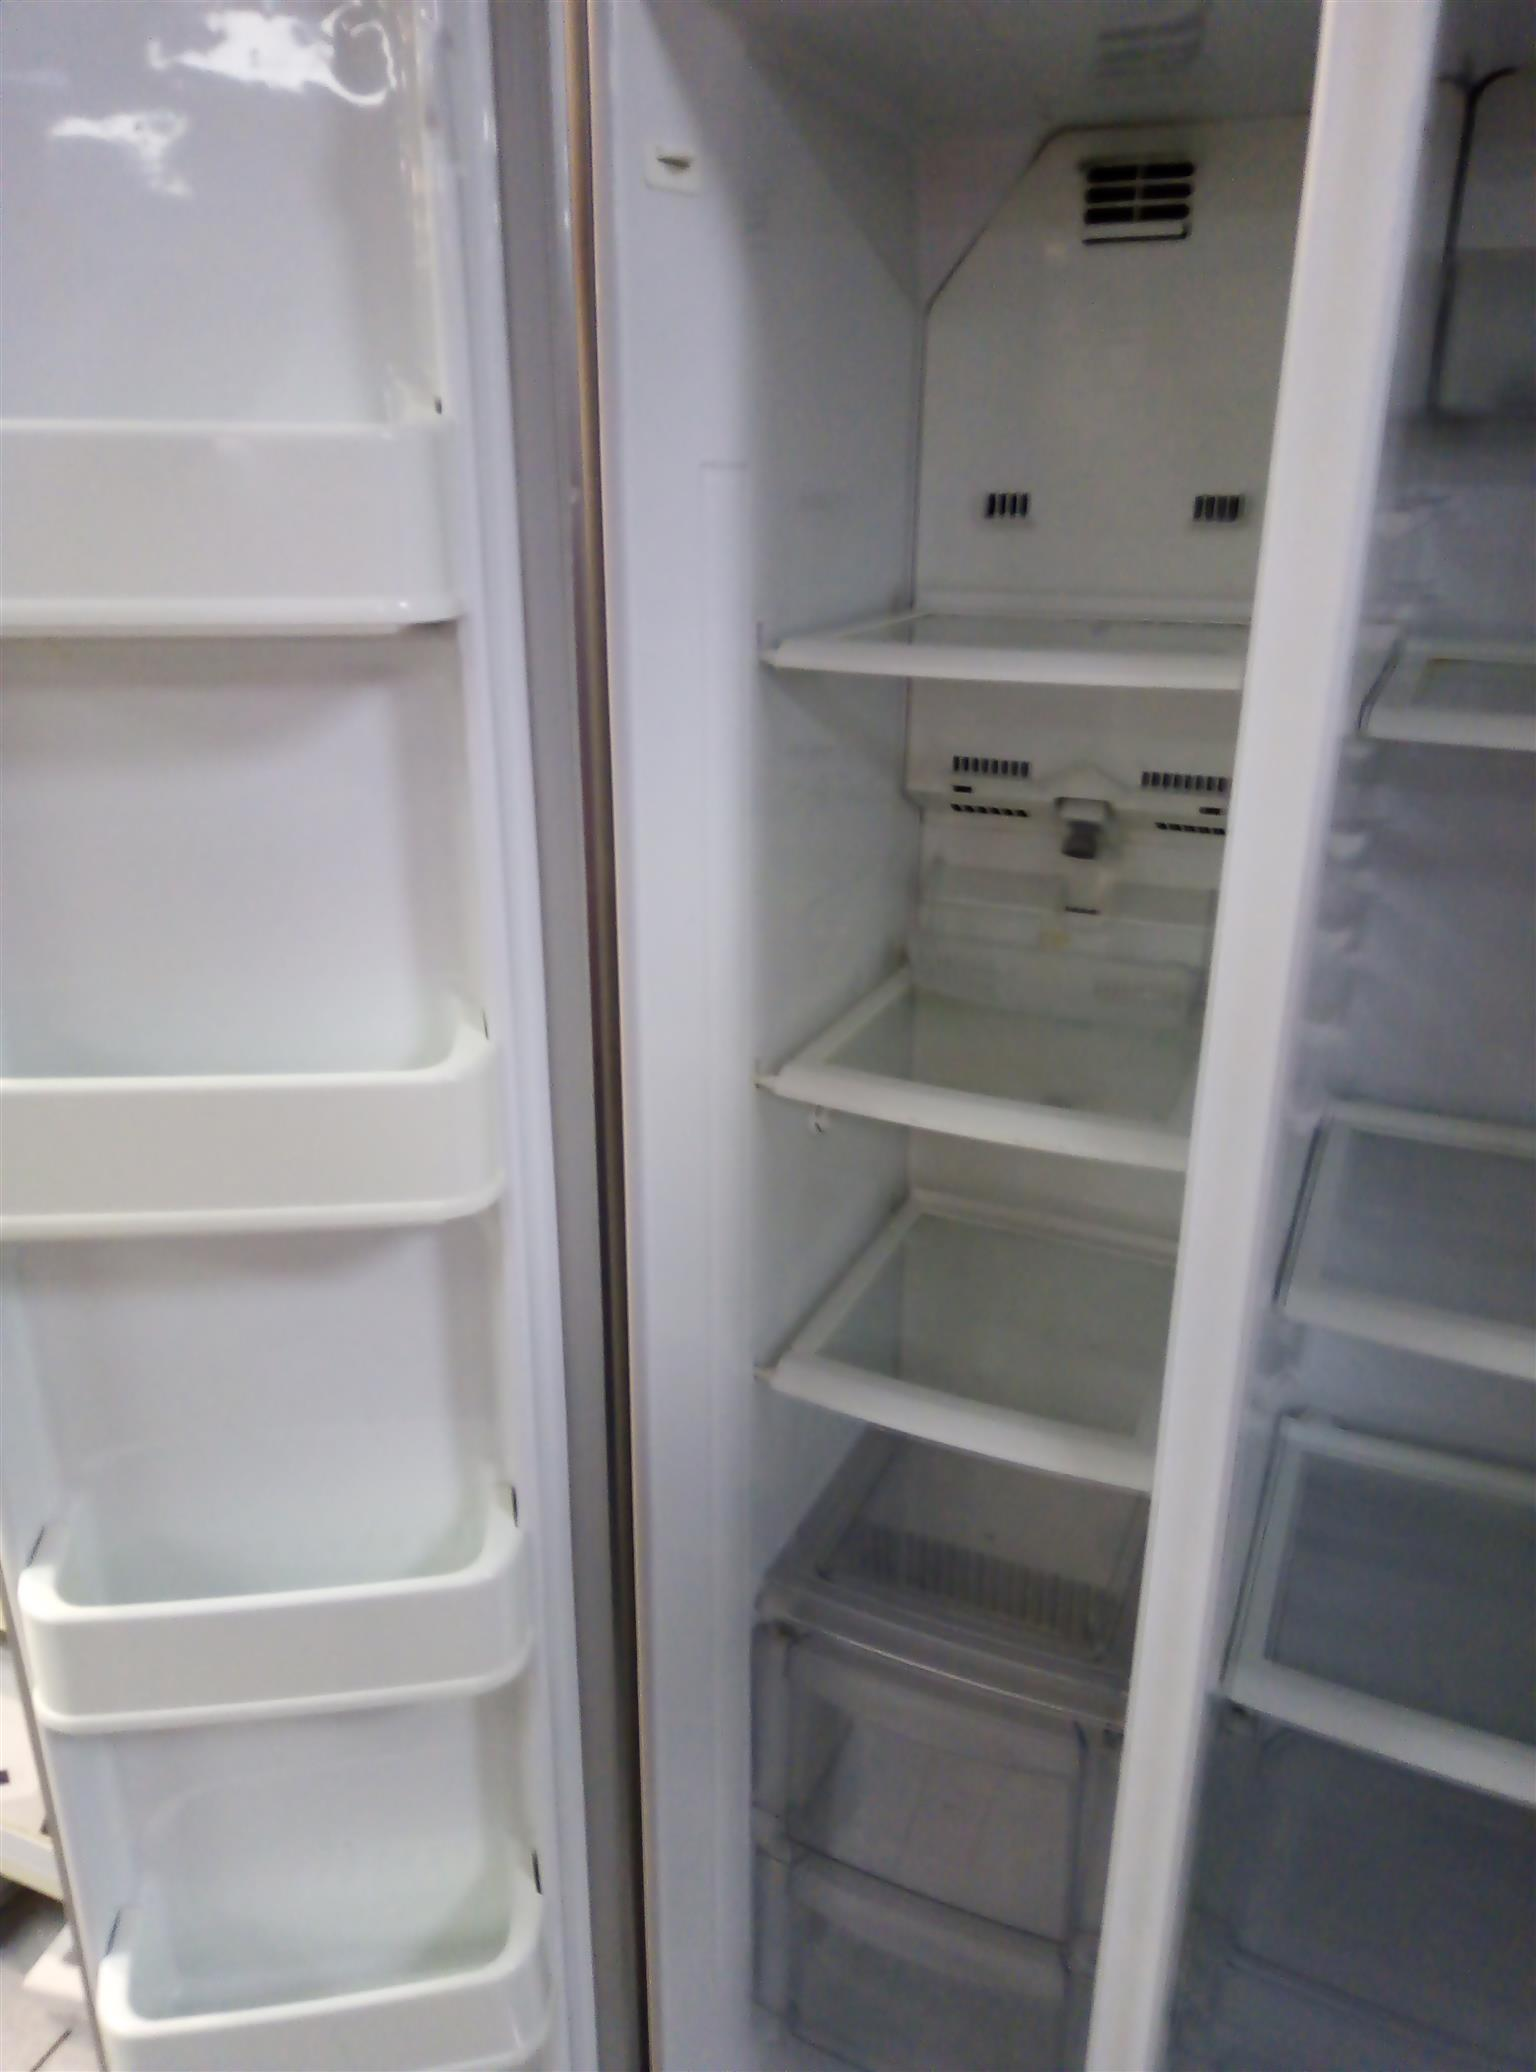 510L LG fridge and freezer